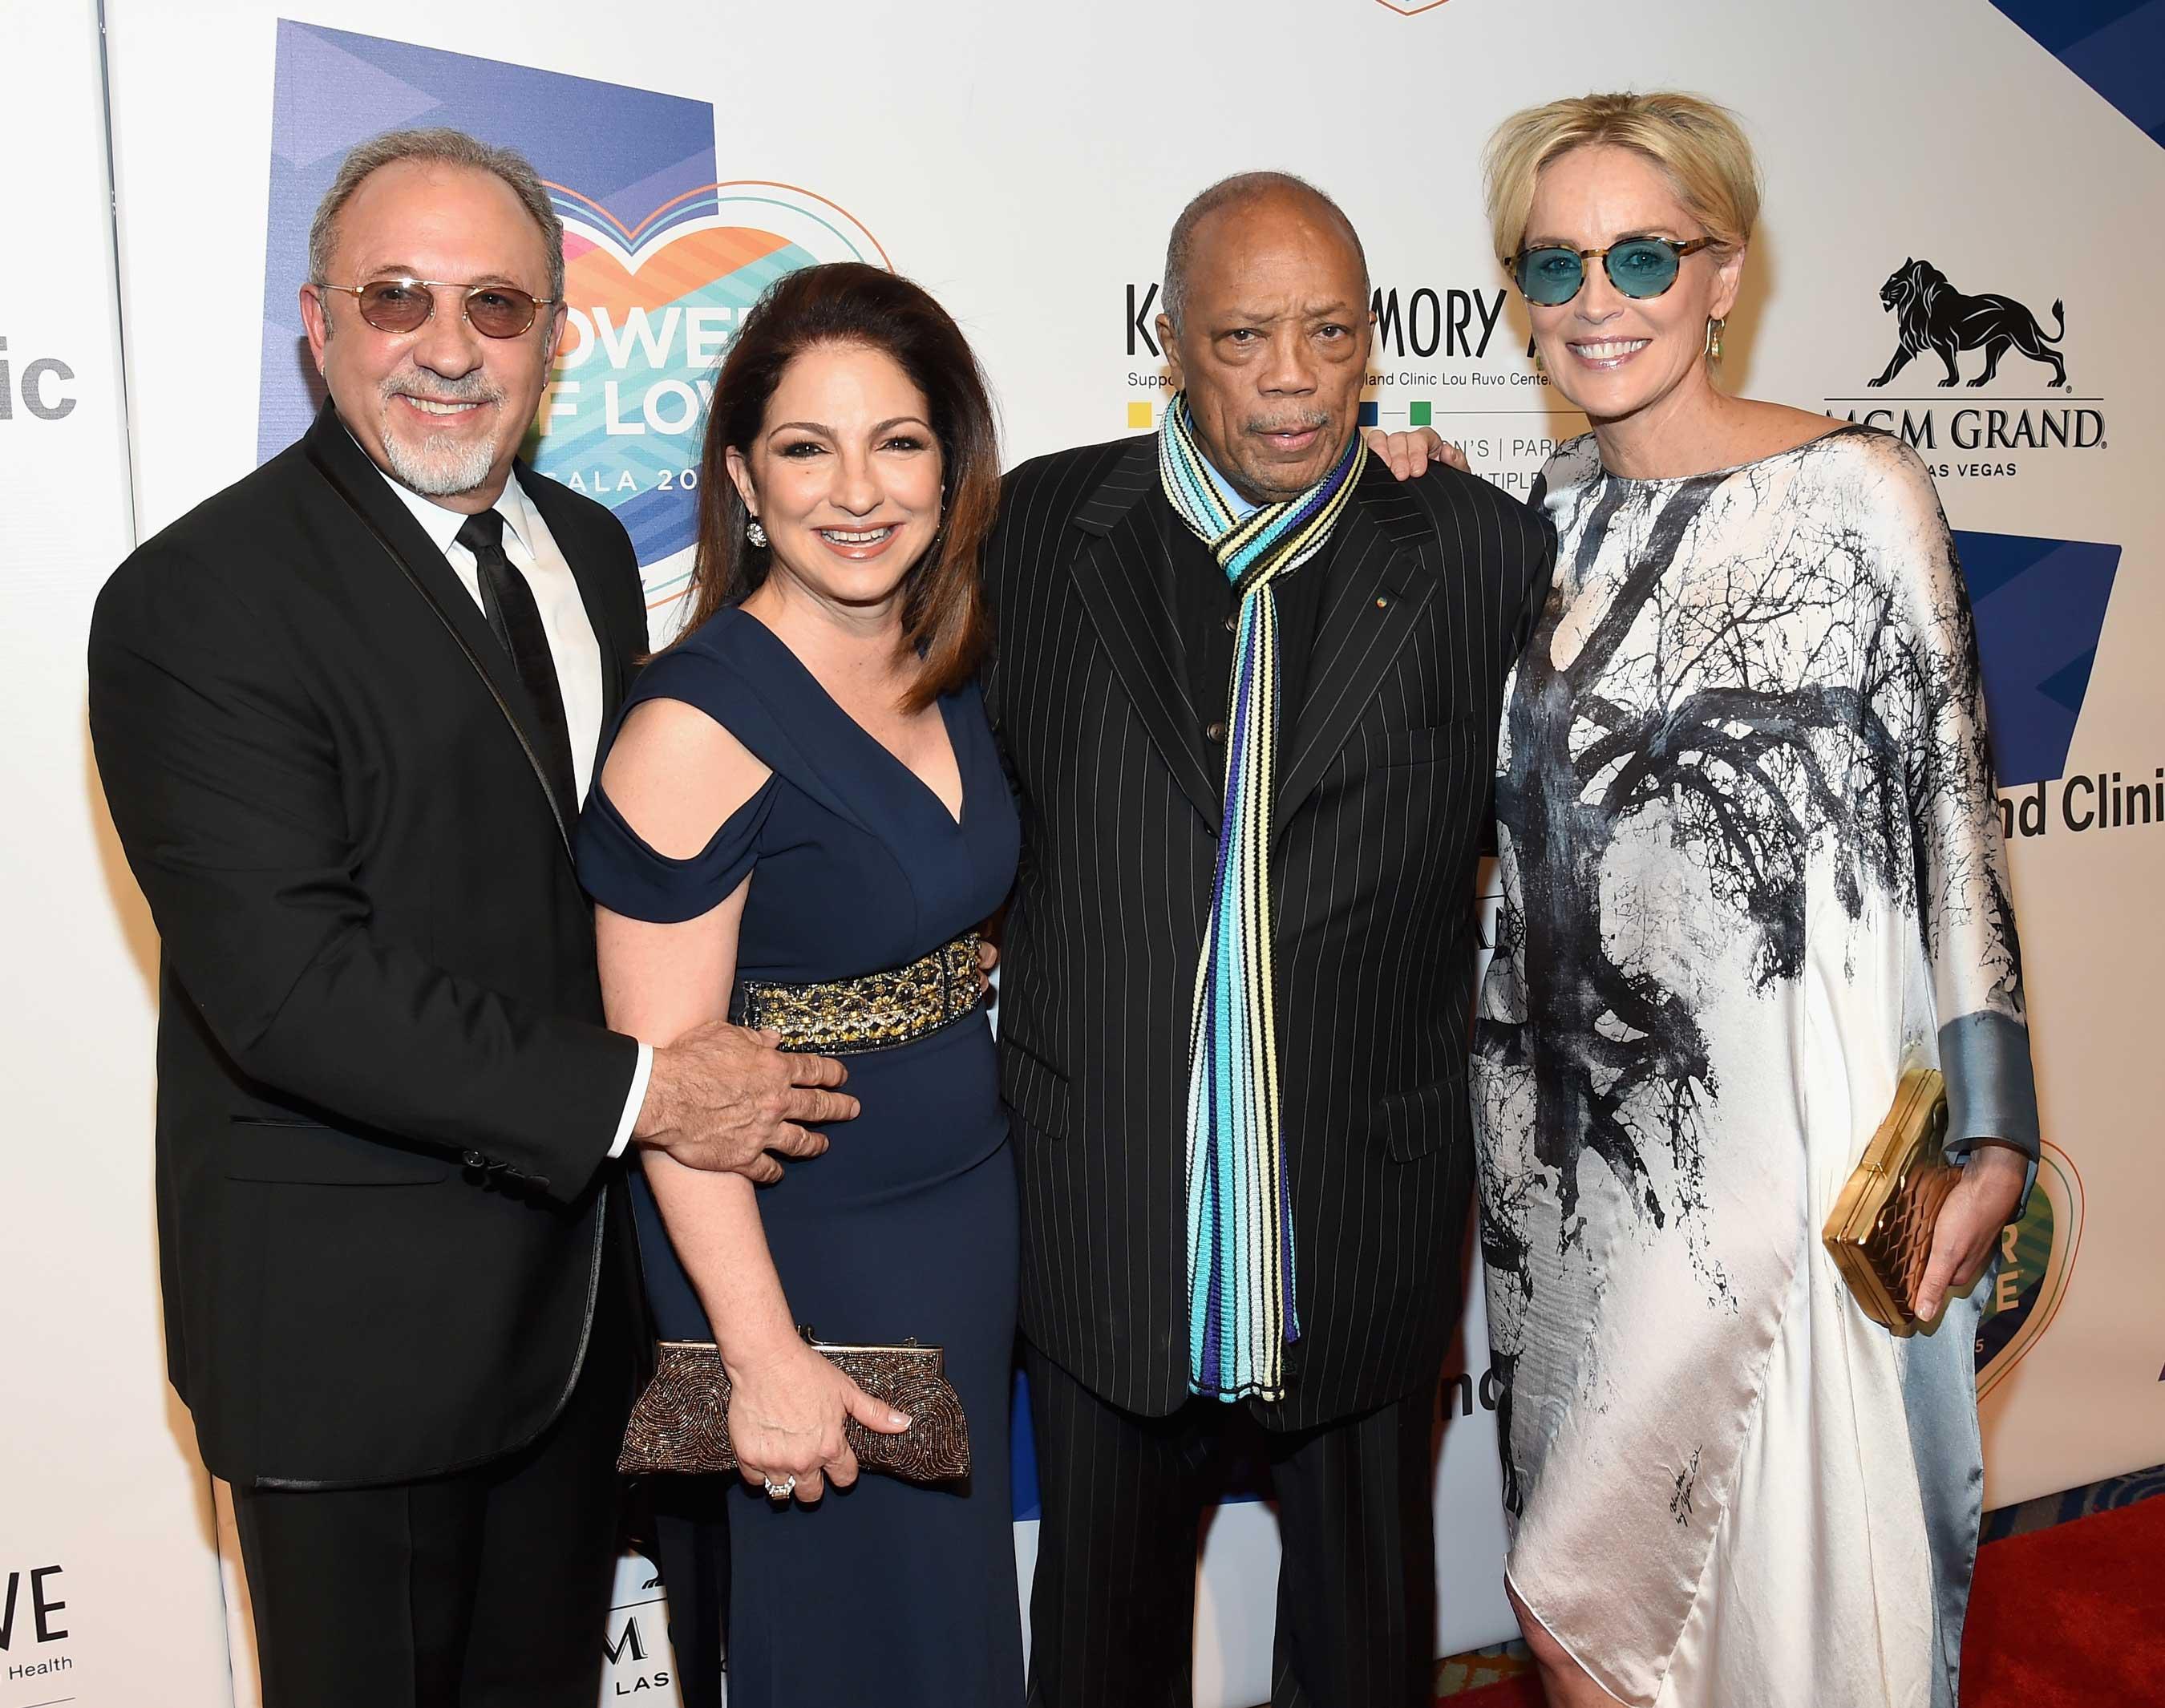 Gloria and Emilio Estefan, Quincy Jones & Sharon Stone at Keep Memory Alive's Power of Love Gala (E Miller June 13, 2015)